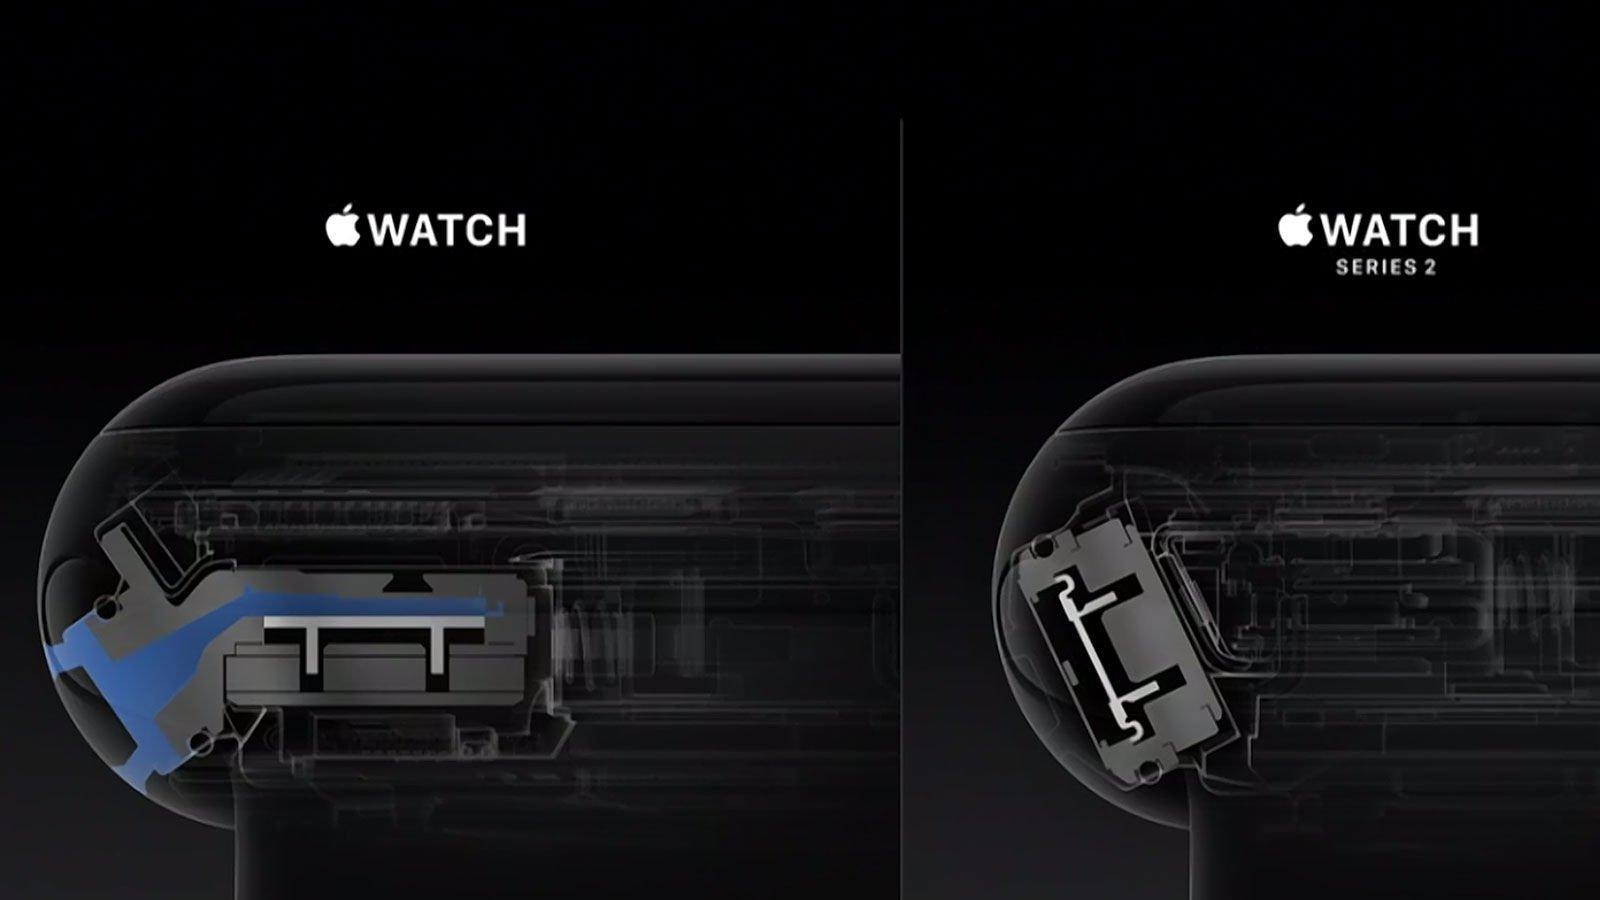 apple watch series 2 recensione everyeye tech. Black Bedroom Furniture Sets. Home Design Ideas